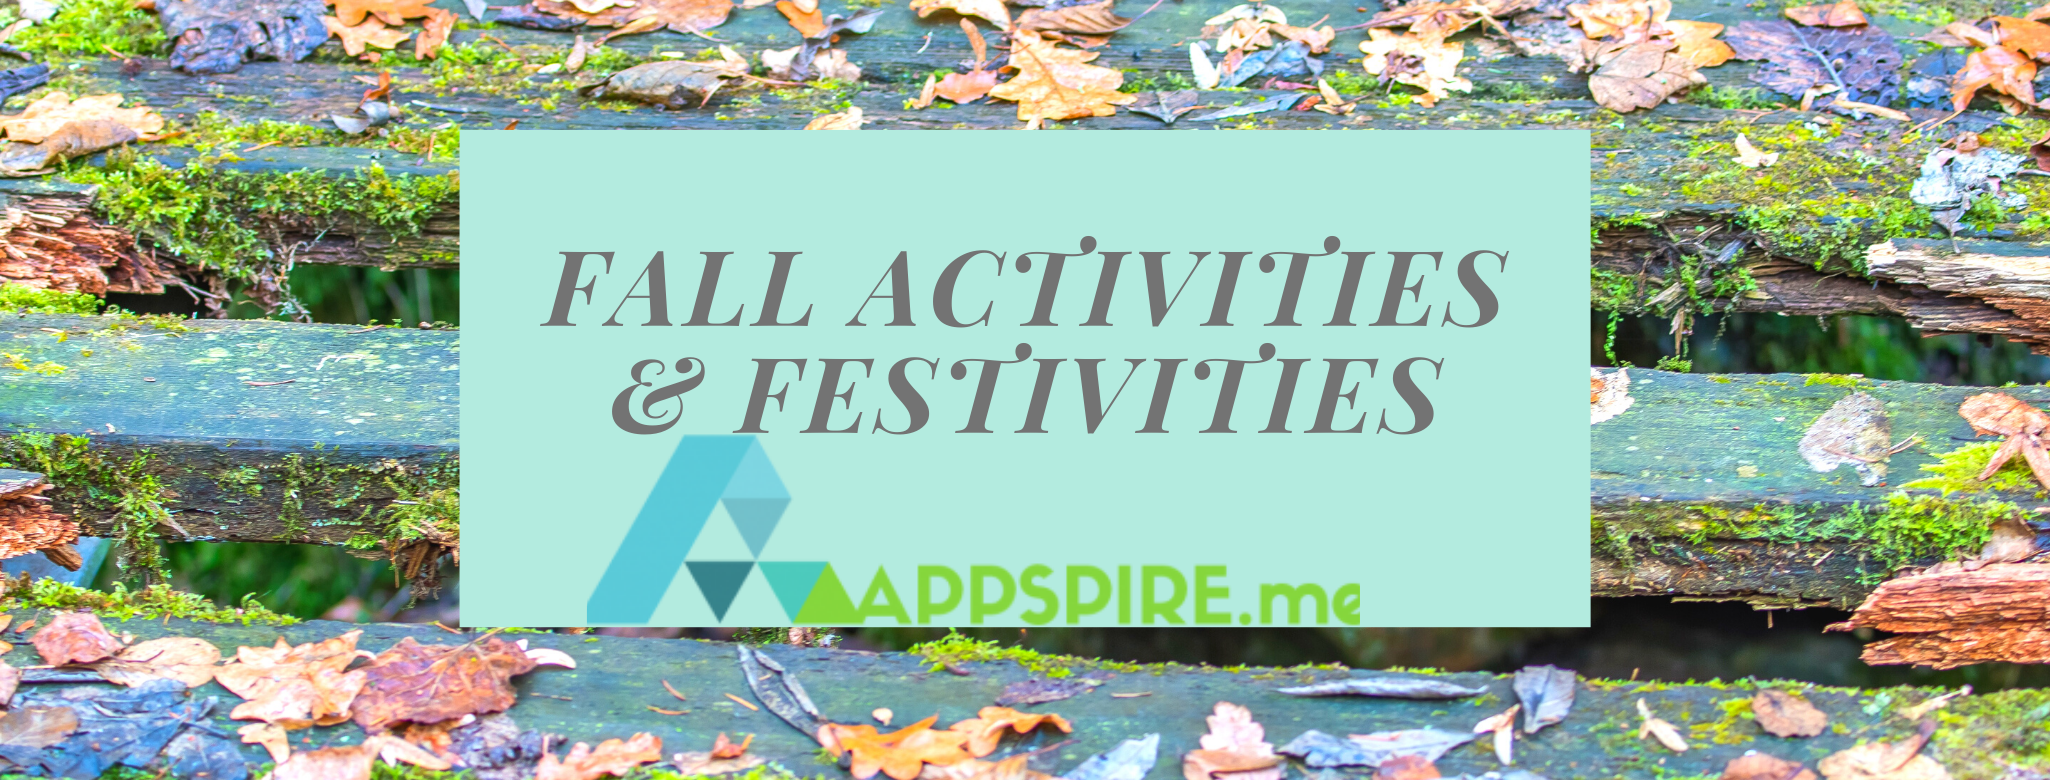 Fall Activities & Festivities